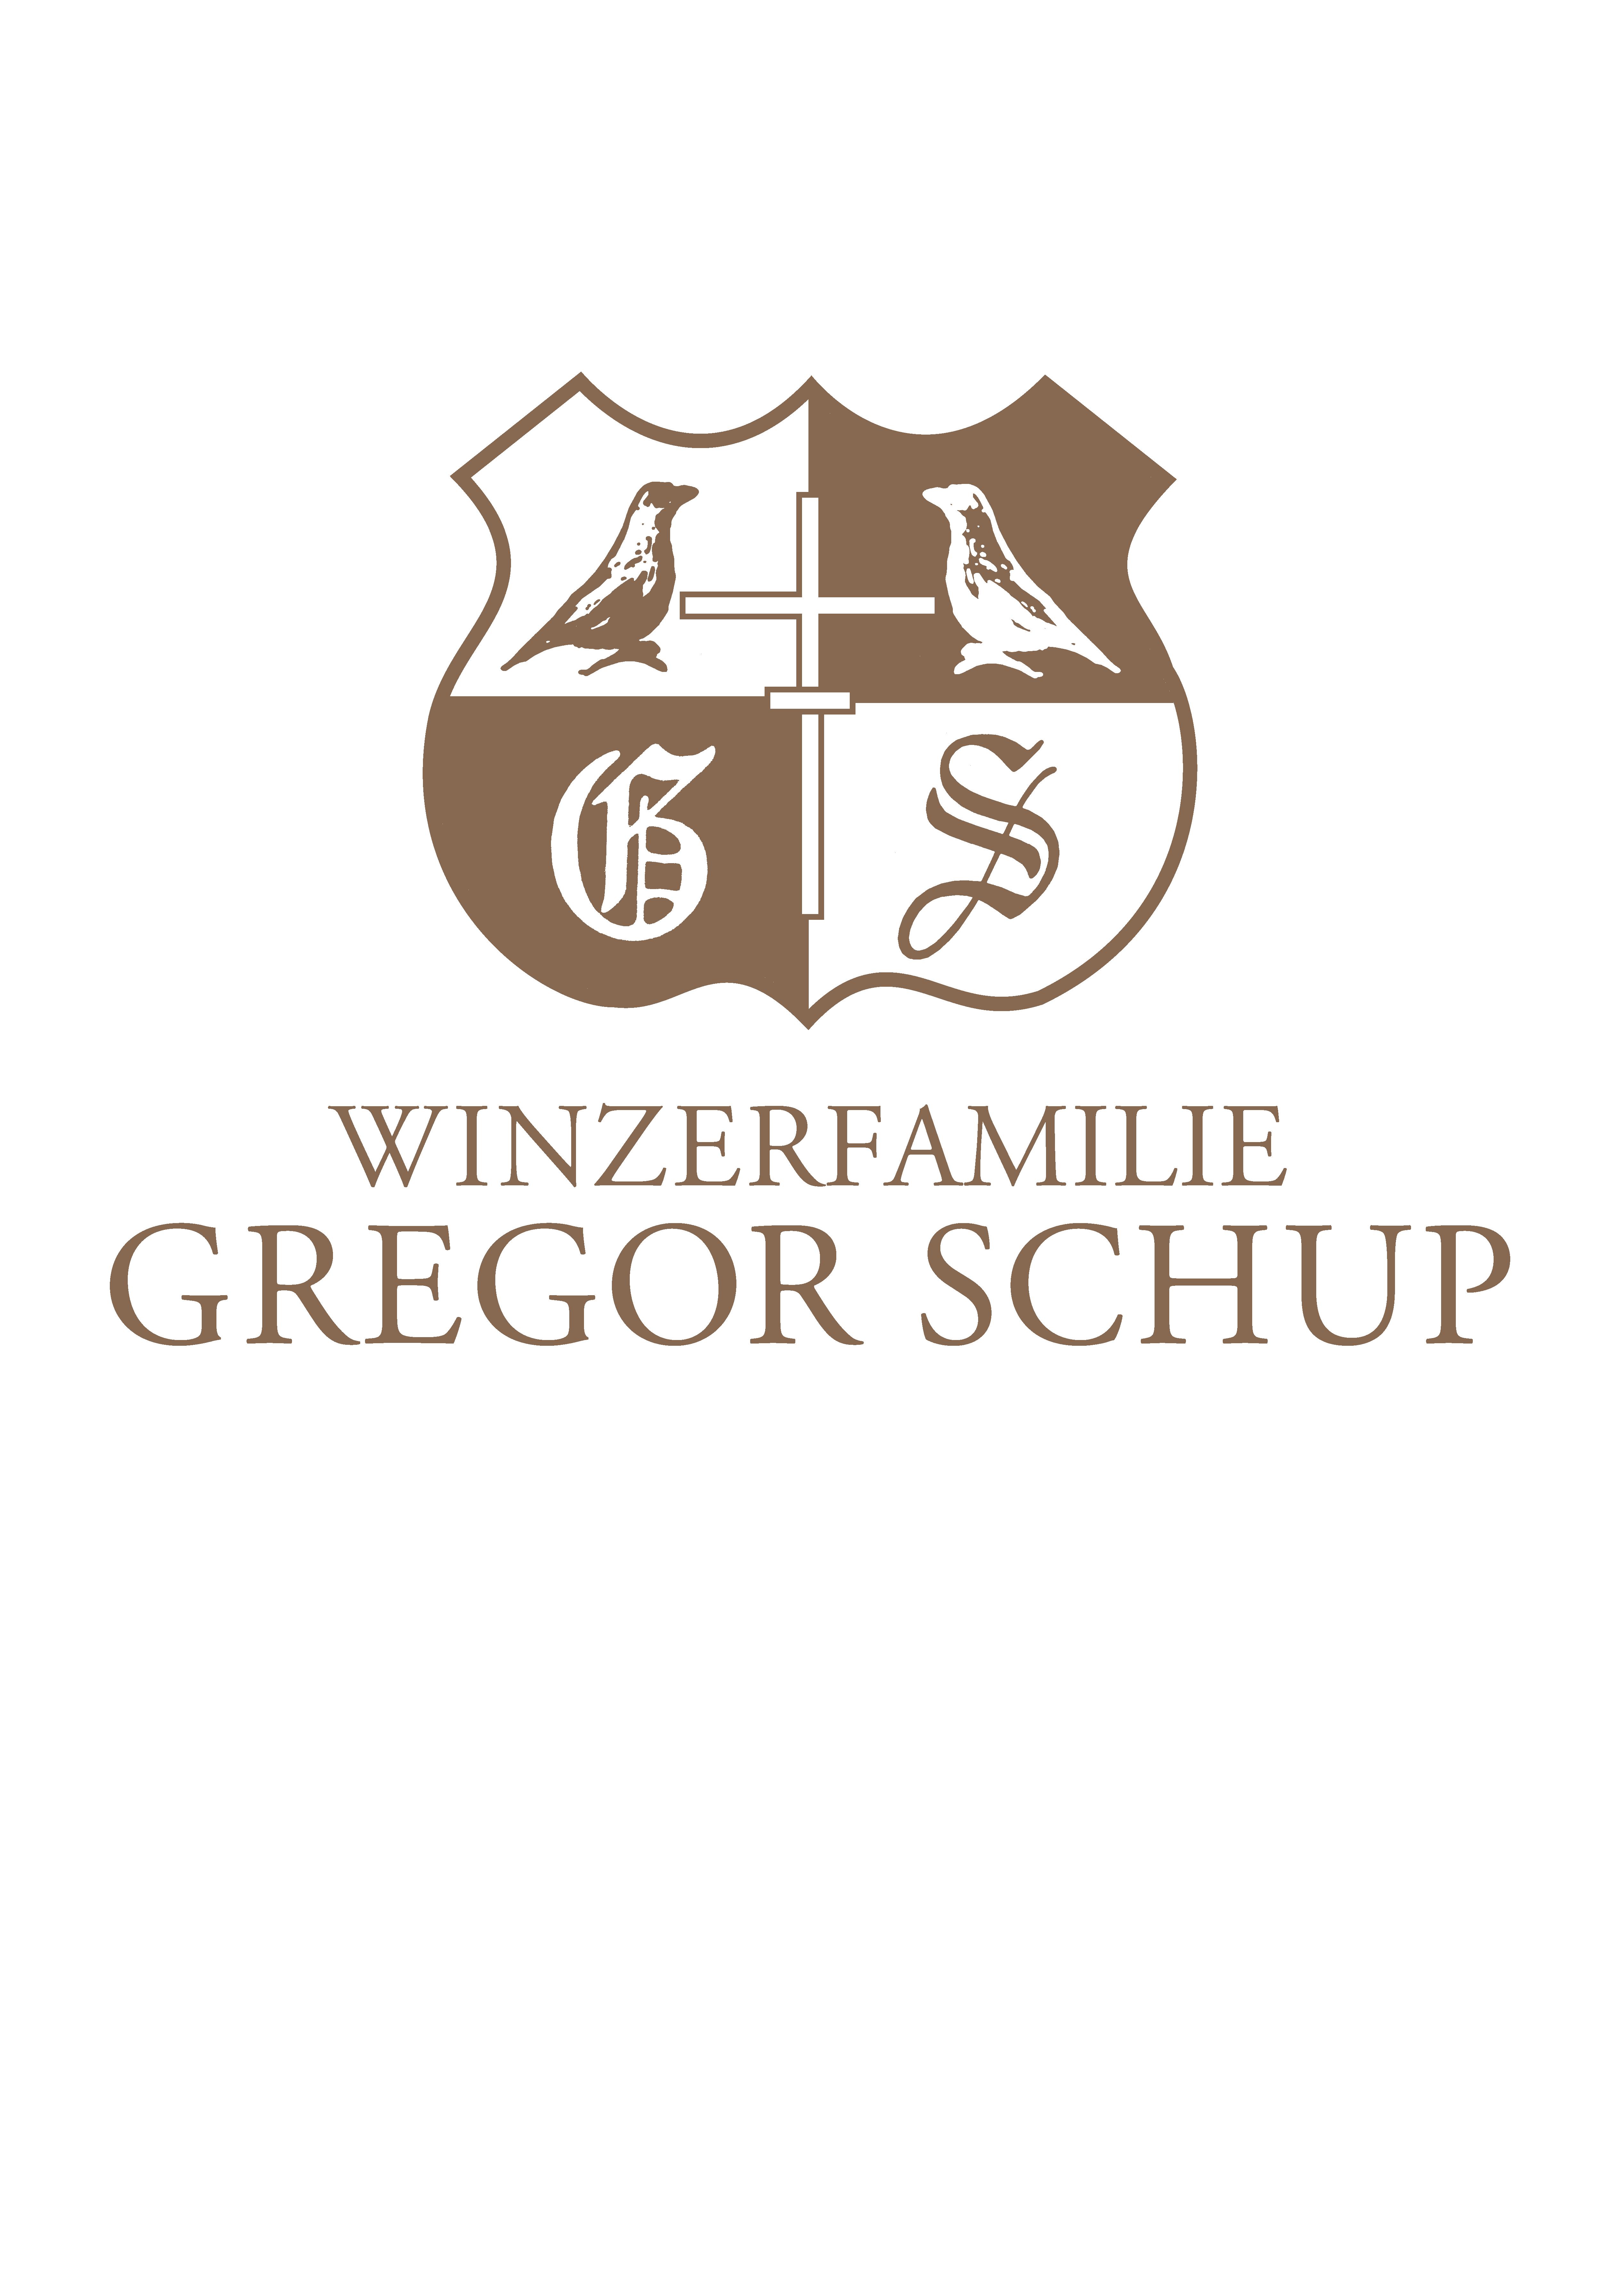 Winzerfamilie Gregor Schup - logo